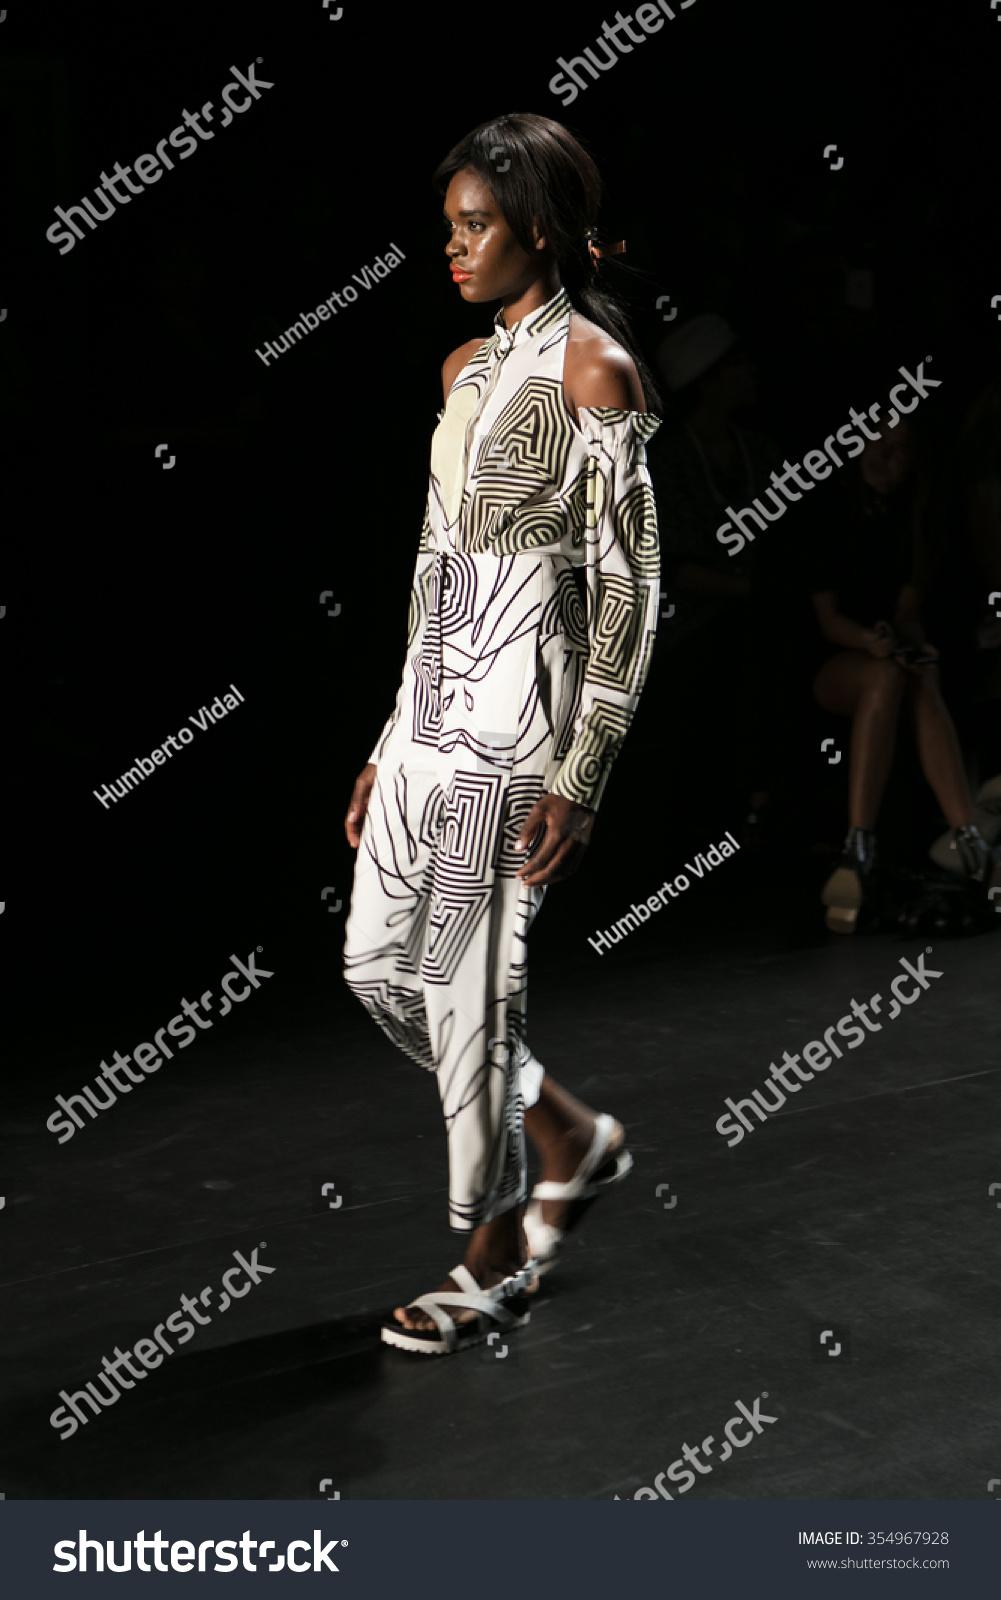 Watch NY Fashion Week 09: Betsey Johnson SpringSummer2010 video